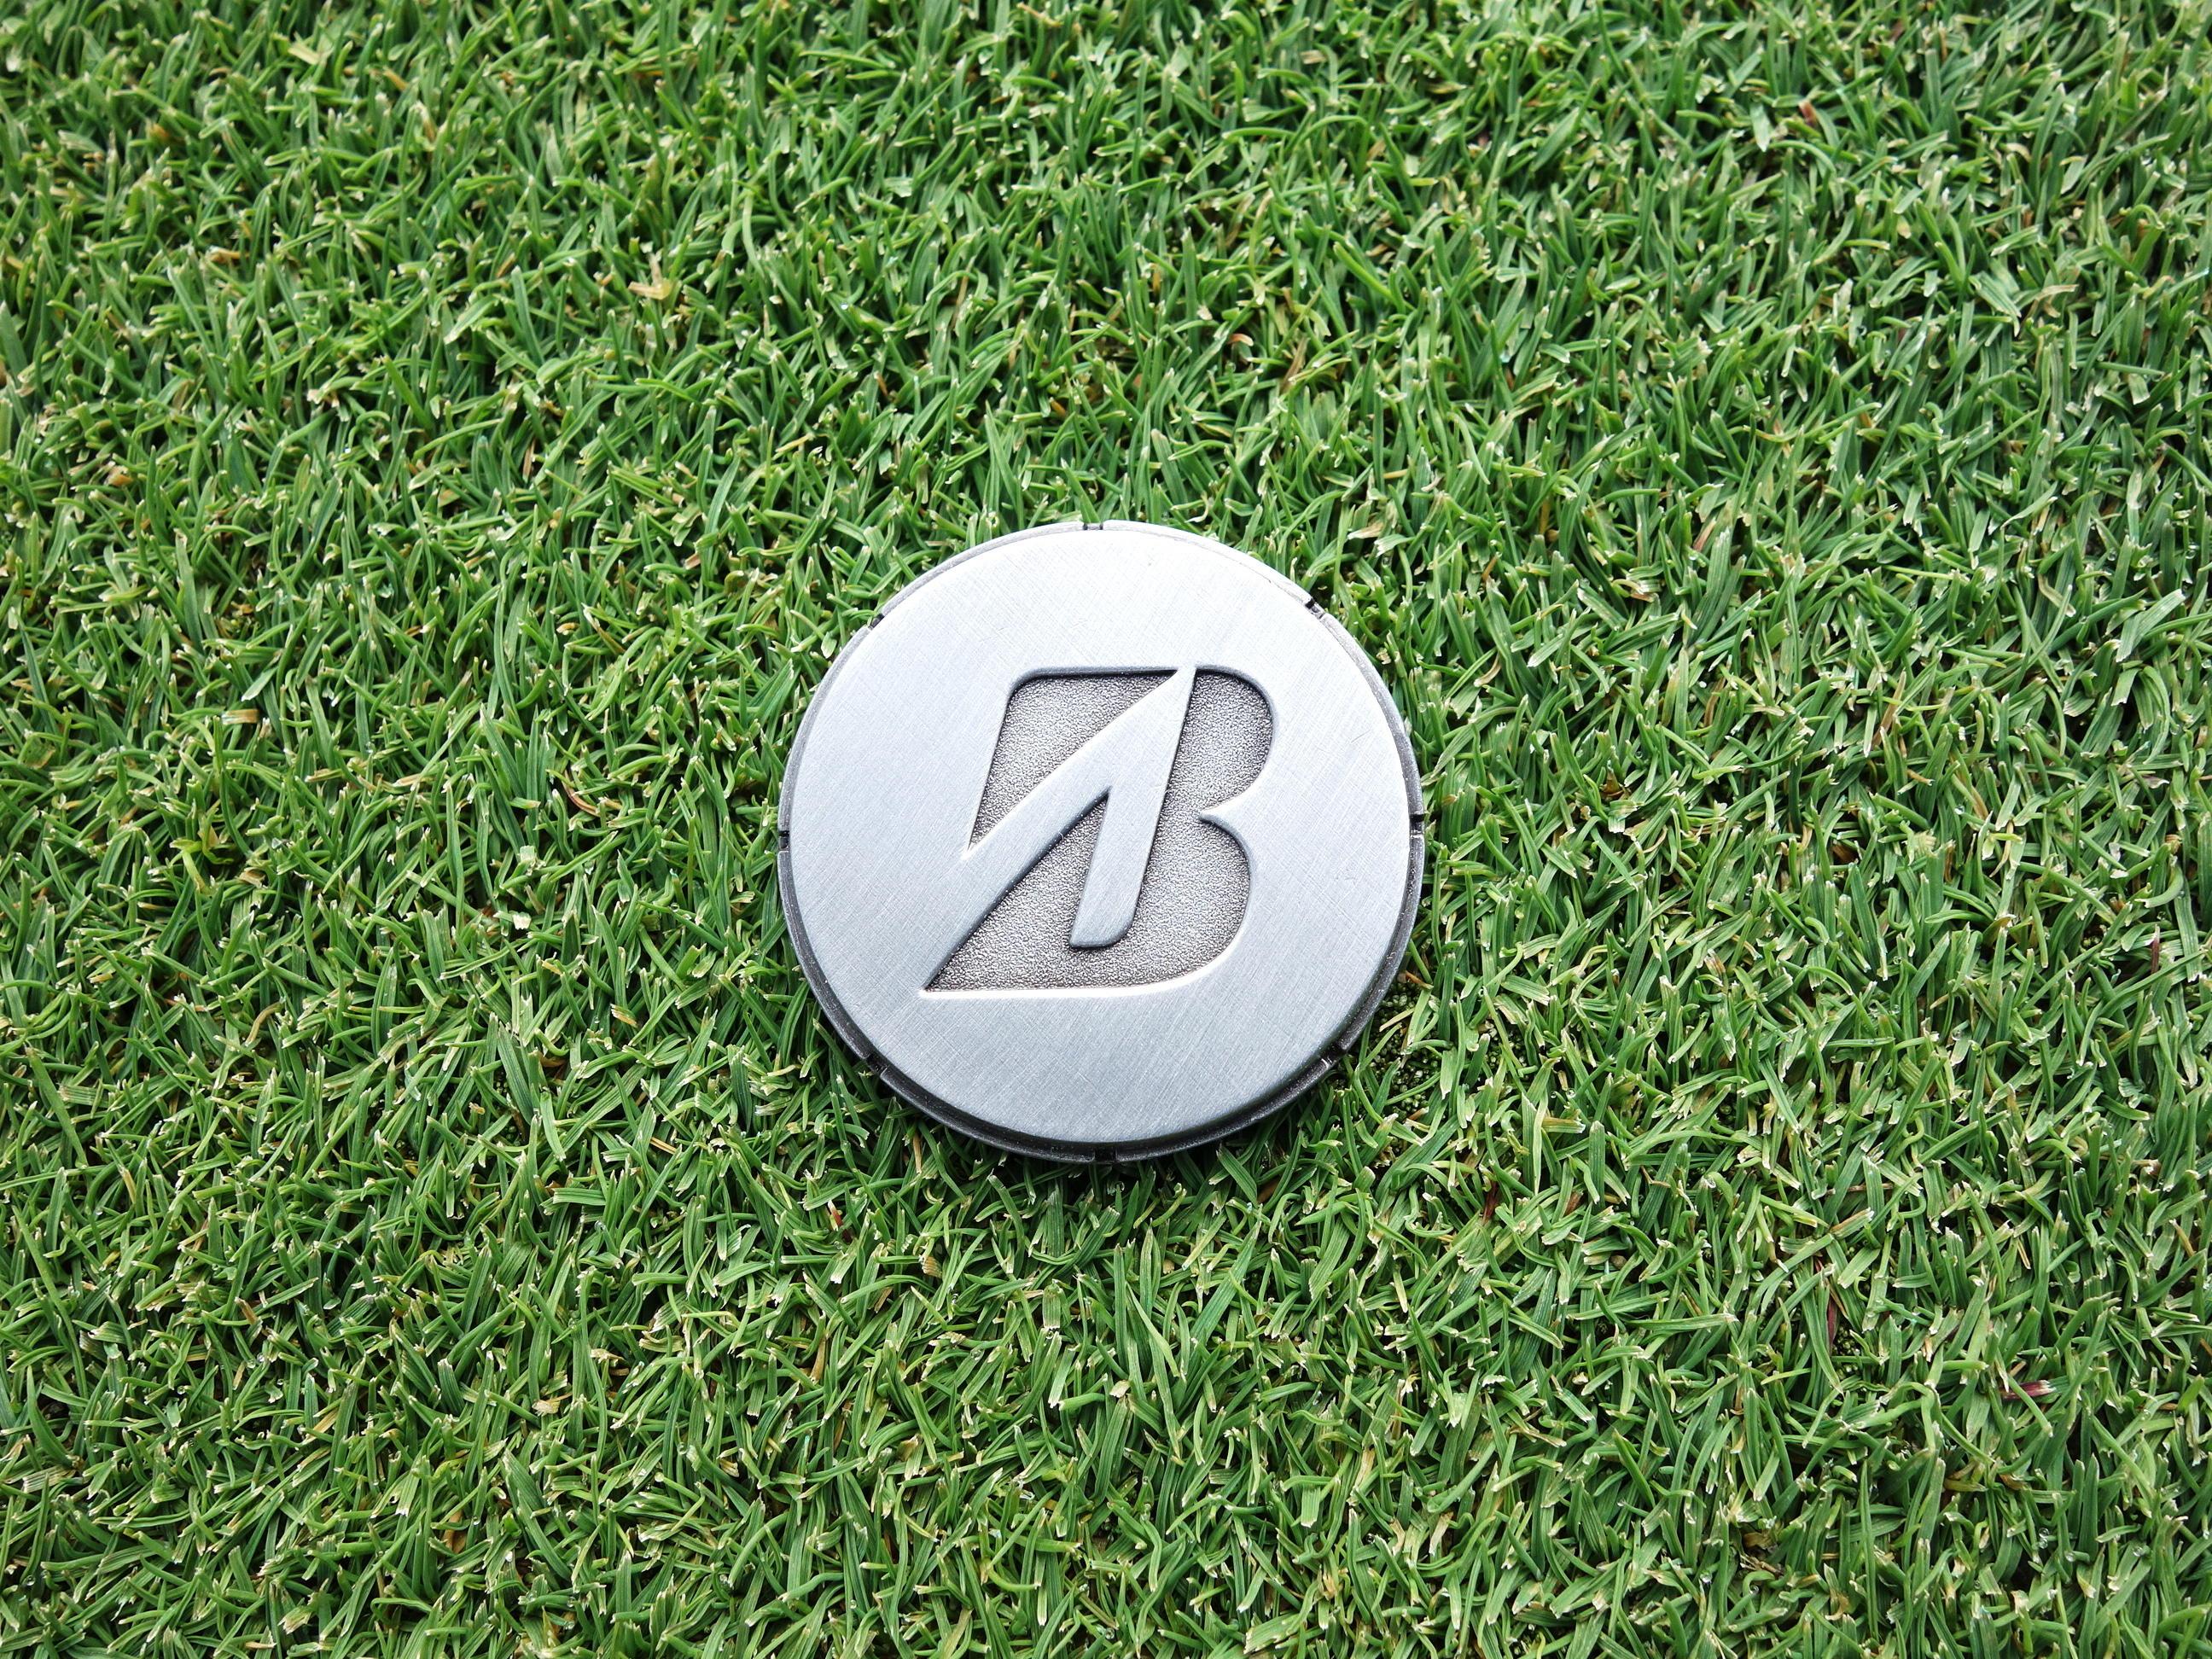 https://www.bs-golf.com/pro/4338bae7abb2035637427268a7113b2c59296b18.JPG